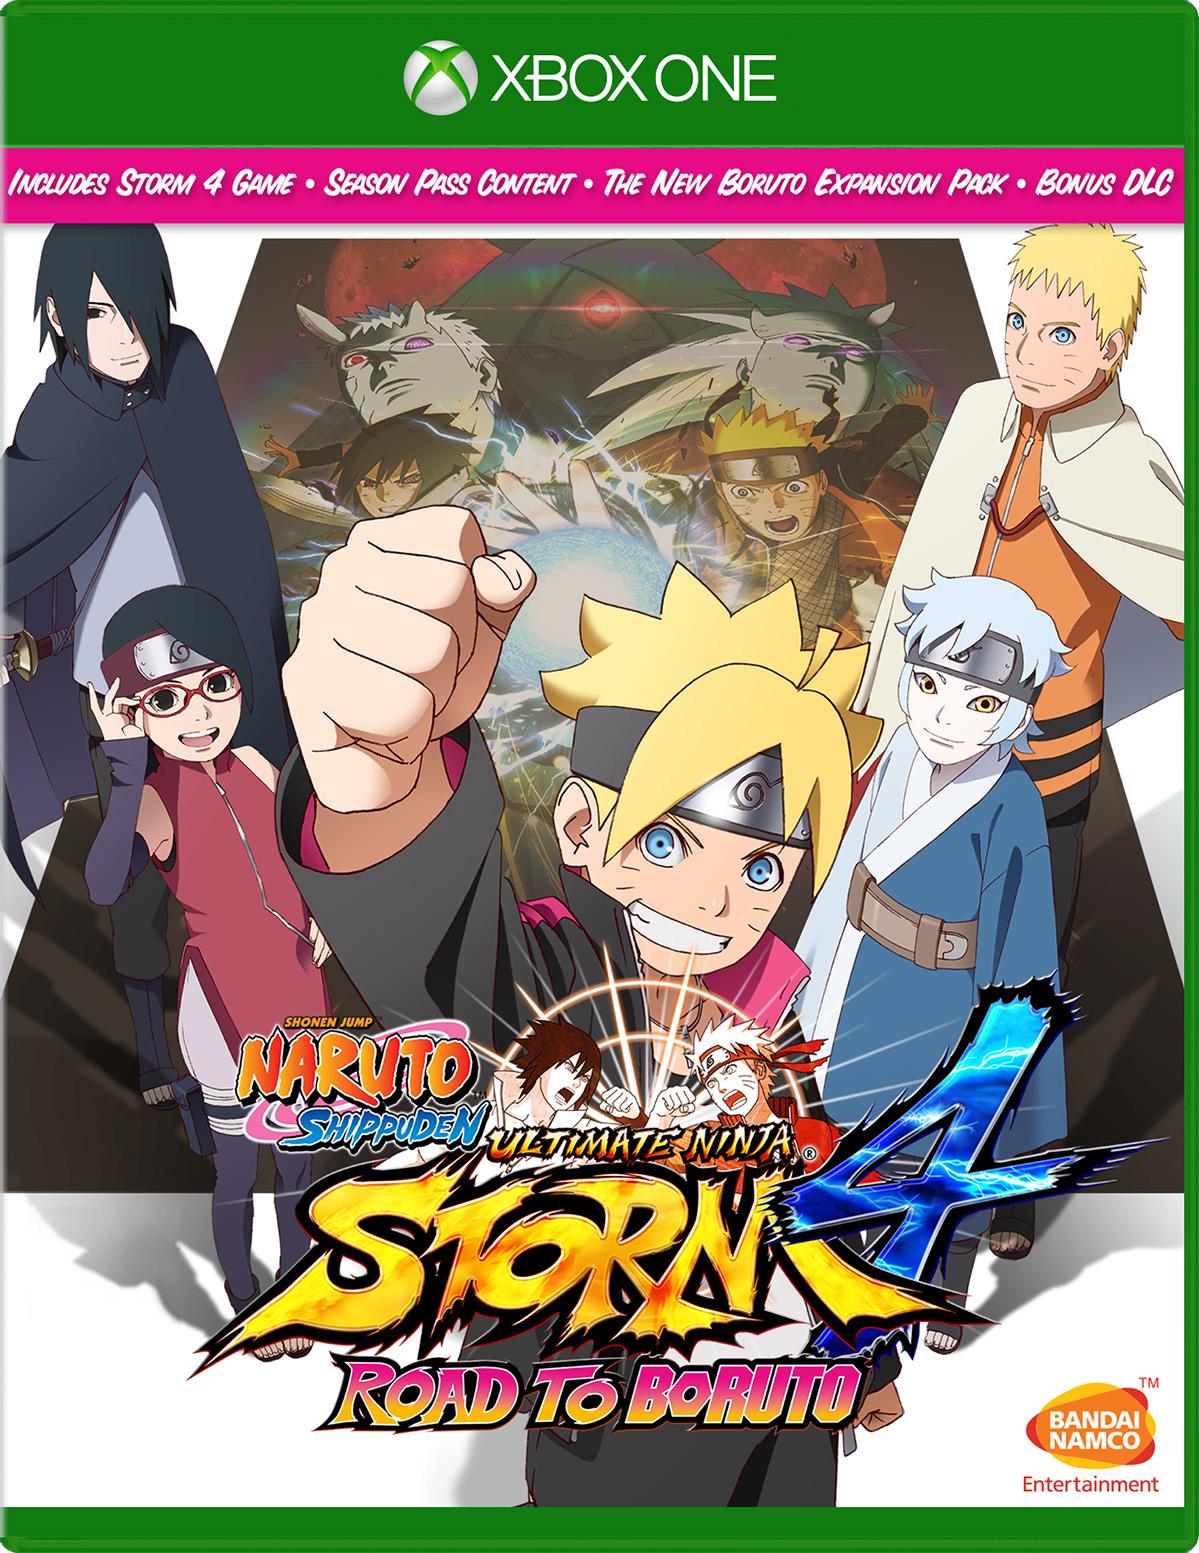 Namco Naruto Shippuden Ultimate Ninja Storm 4: Road to Boruto Deal